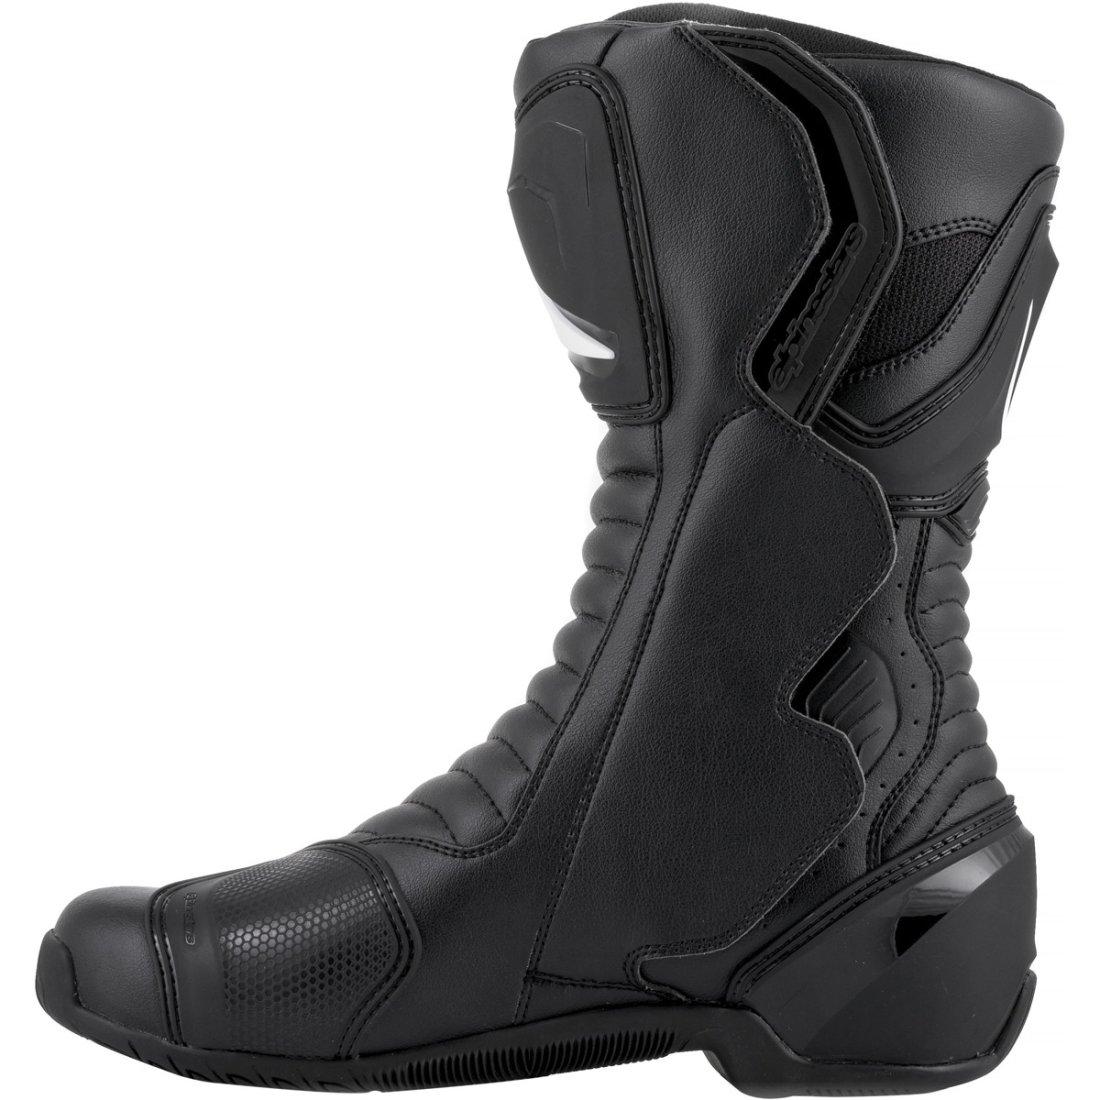 ALPINESTARS SMX-6 V2 Gore-Tex Black Boots · Motocard a1b6bca0a38